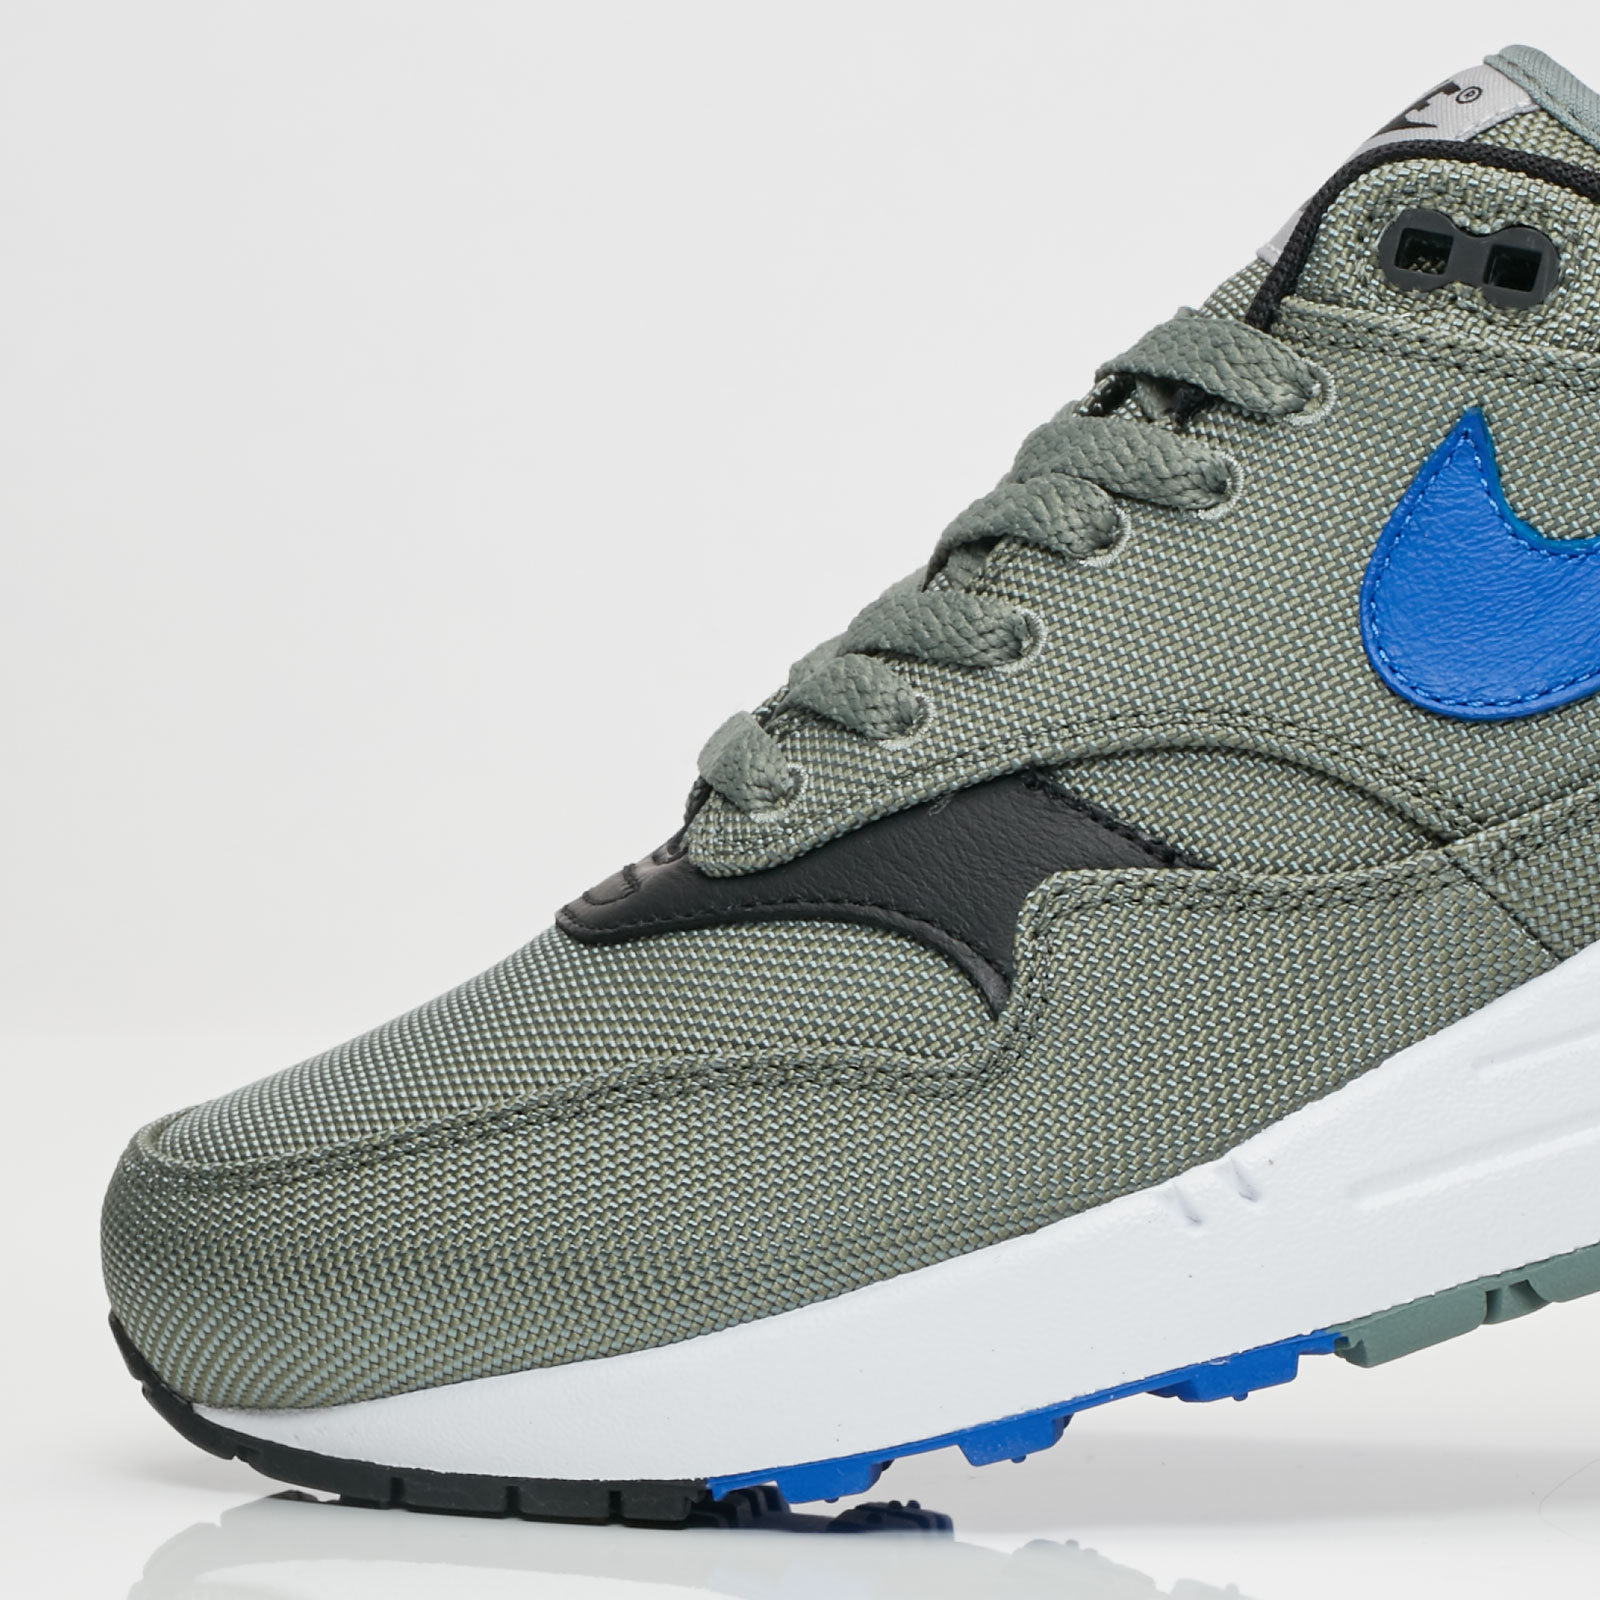 buy online 1d675 6d340 Nike Sportswear Air Max 1 Premium - 6. Close